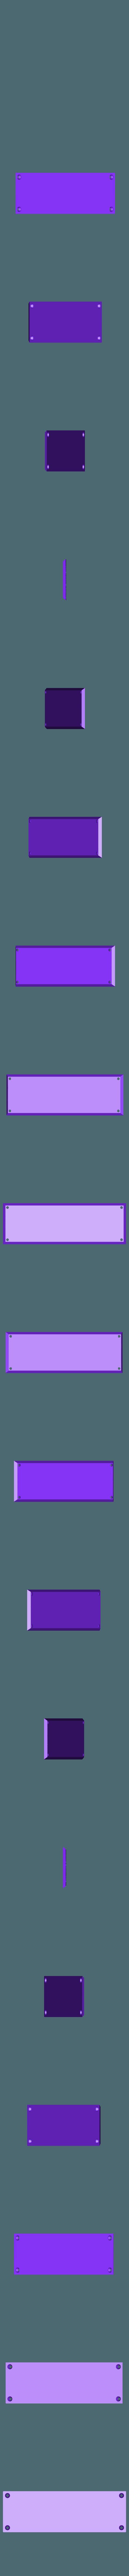 poly-coper_batt.stl Download free STL file Poly 3D Printer Frame • 3D printer design, Poly